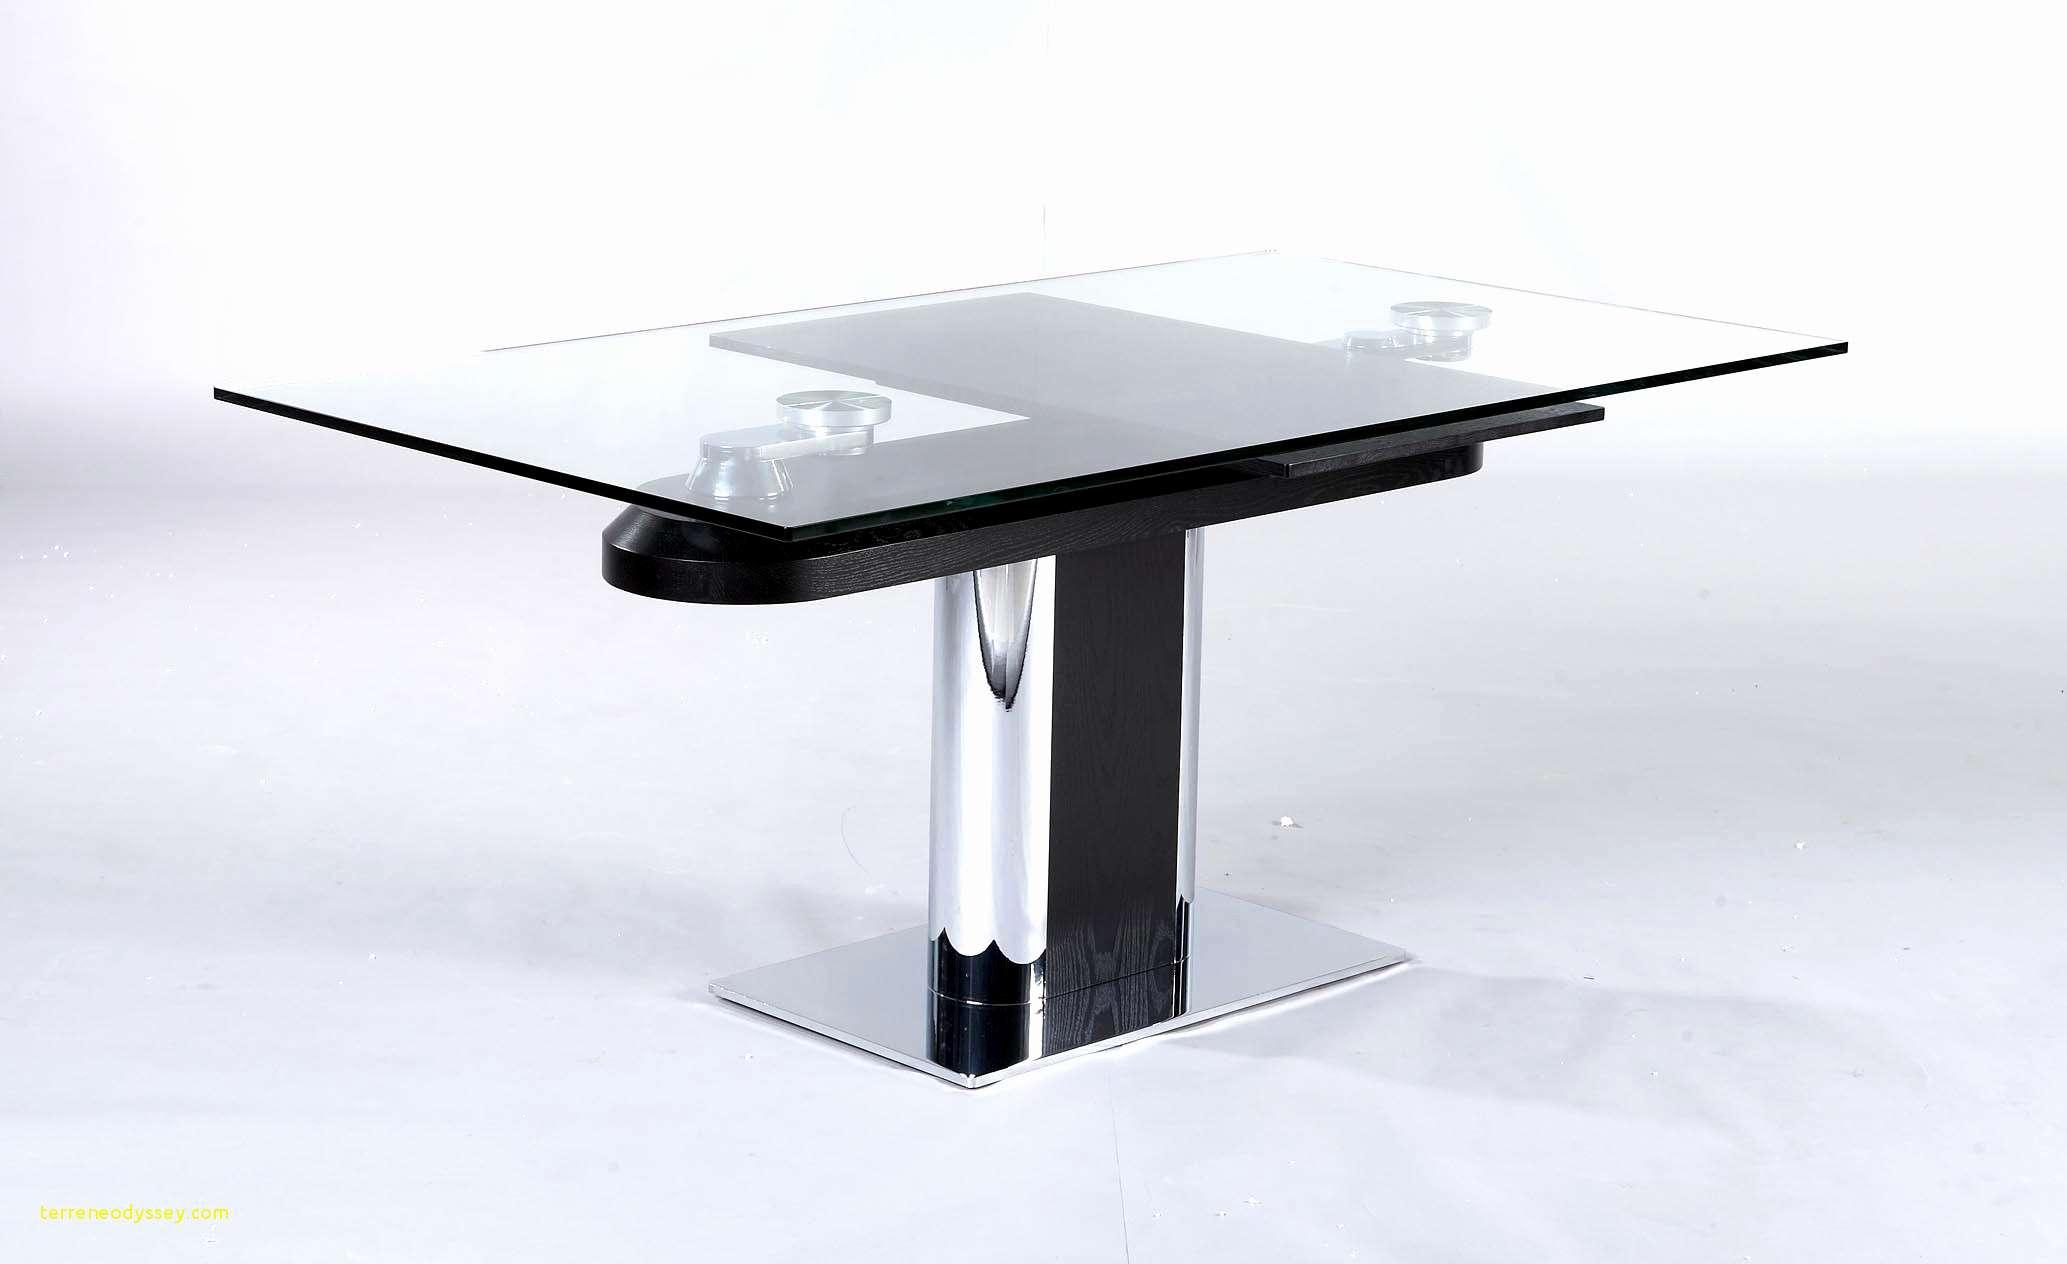 bureau verre trempe fresh 46 elegant de table ronde en verre trempe of bureau verre trempe